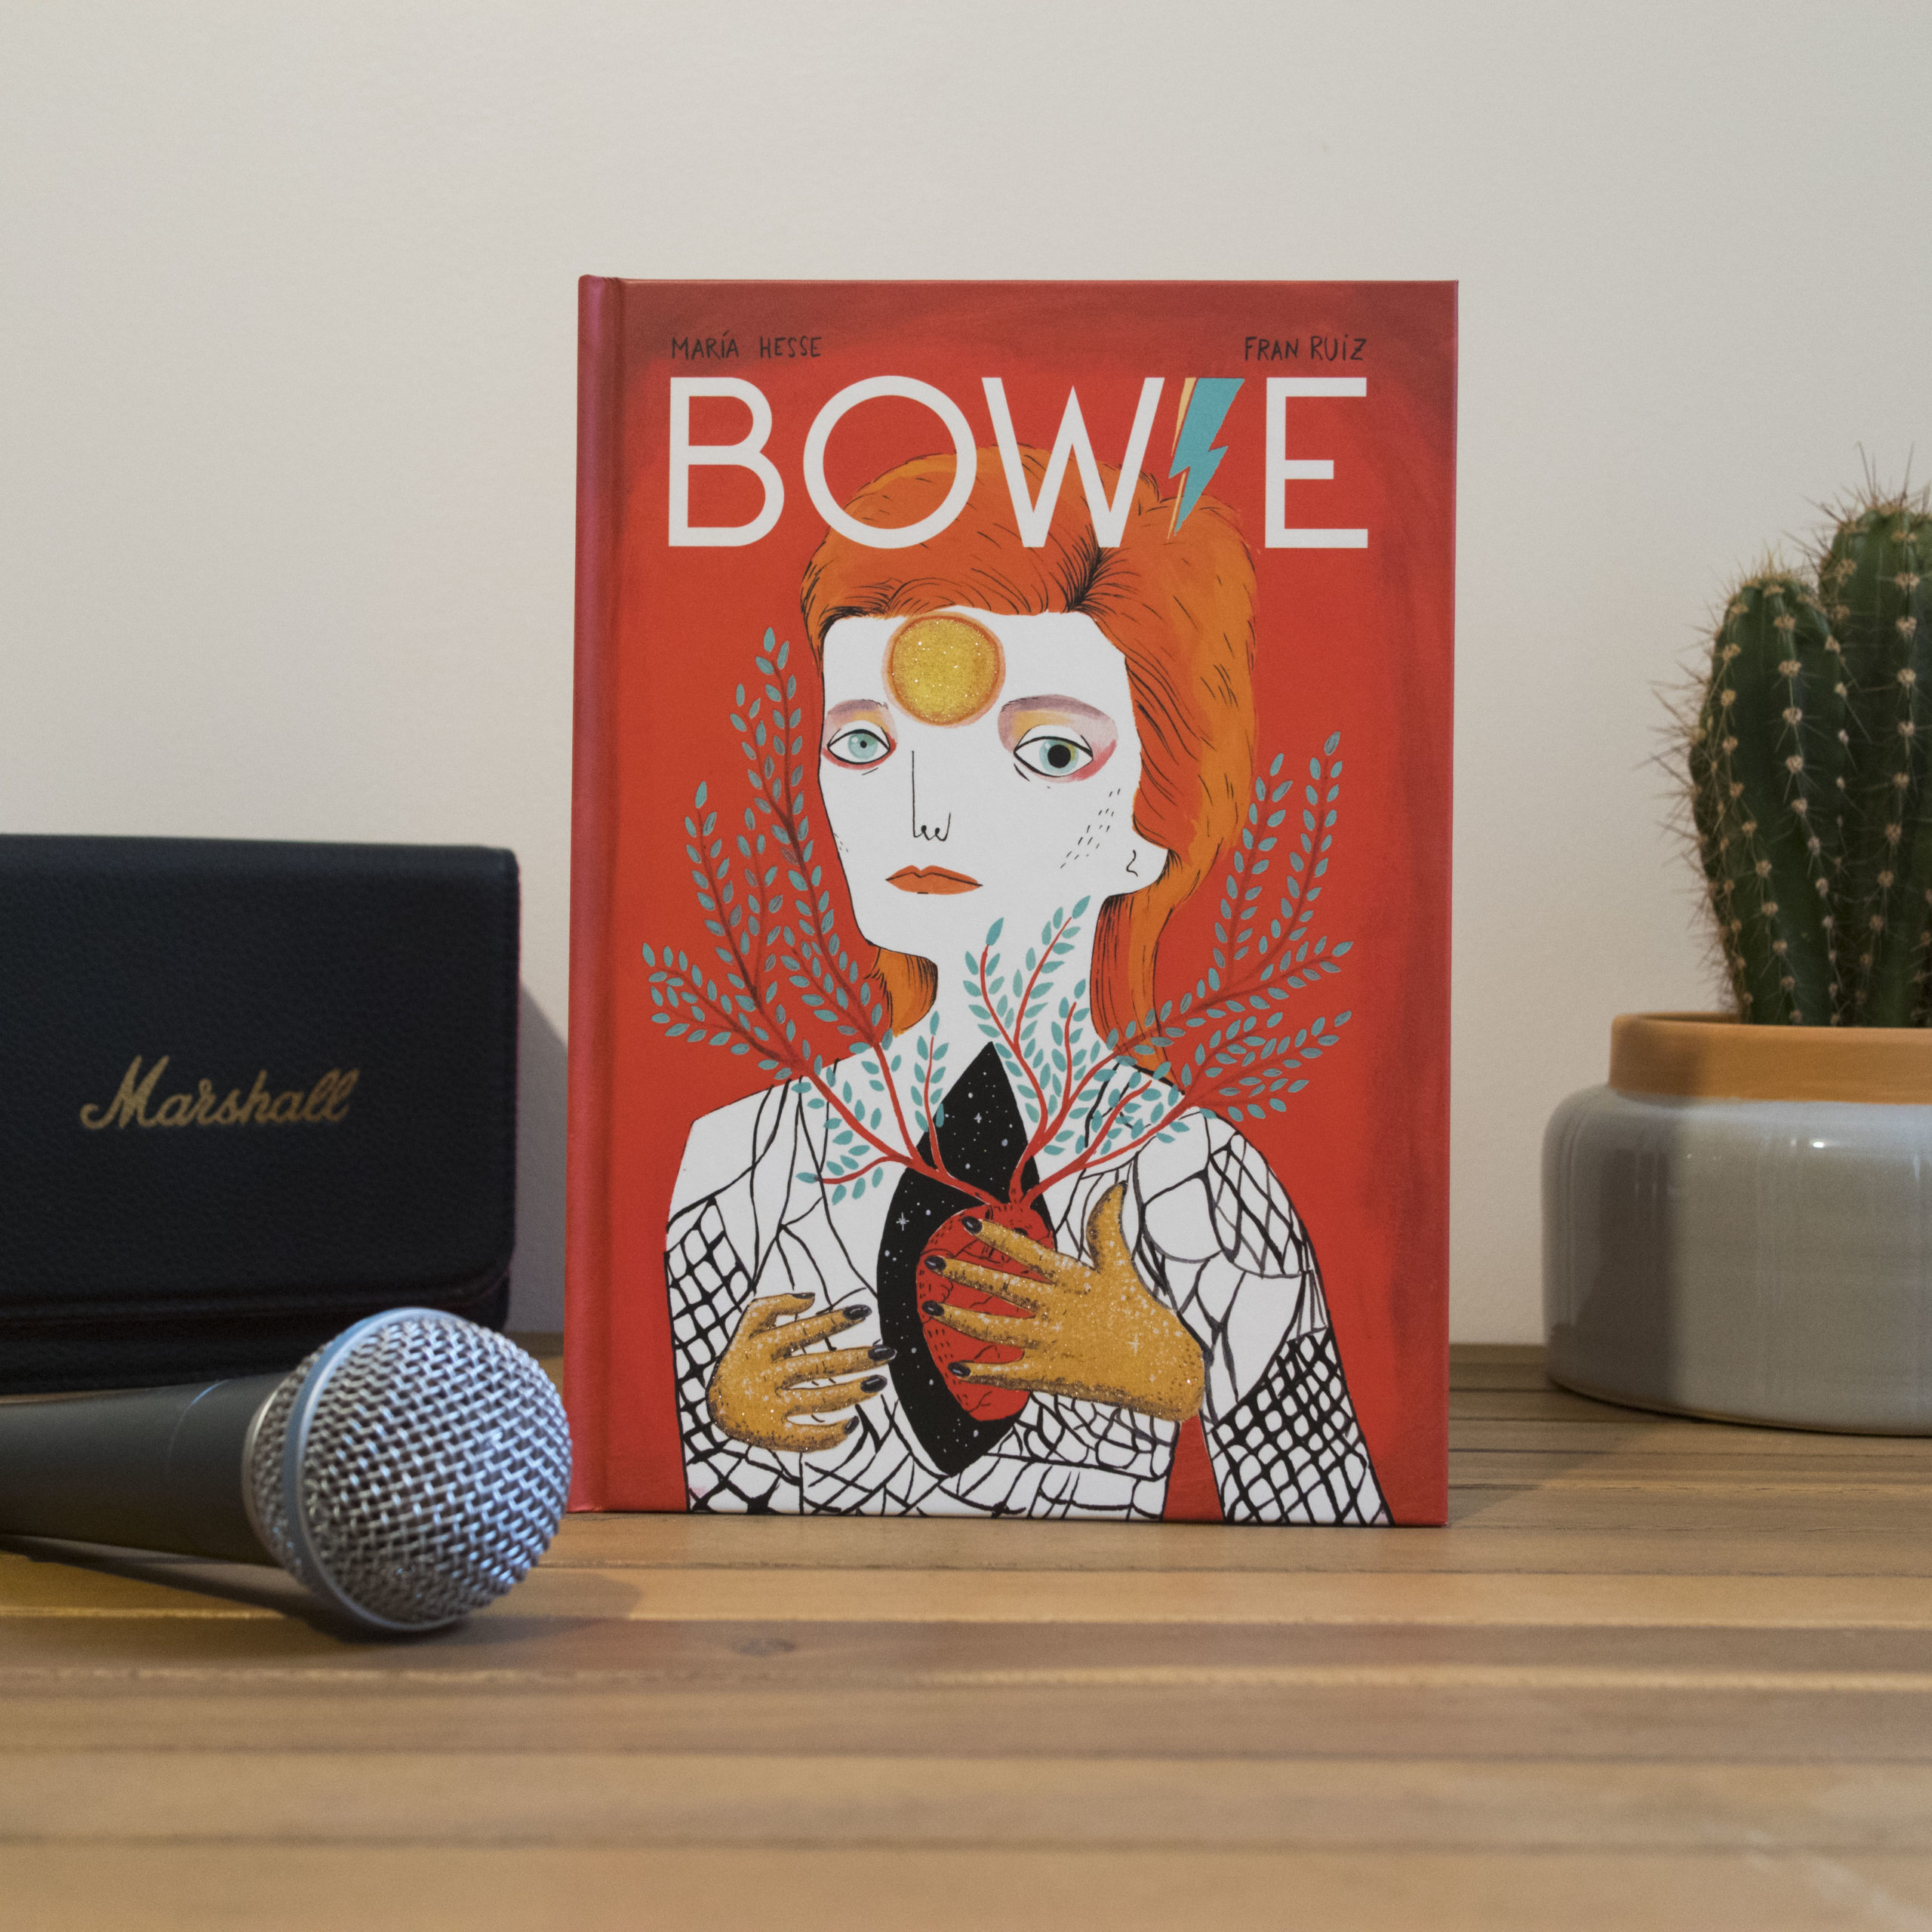 David Bowie Maria Hesse, Fran Ruiz, éditions Presque Lune